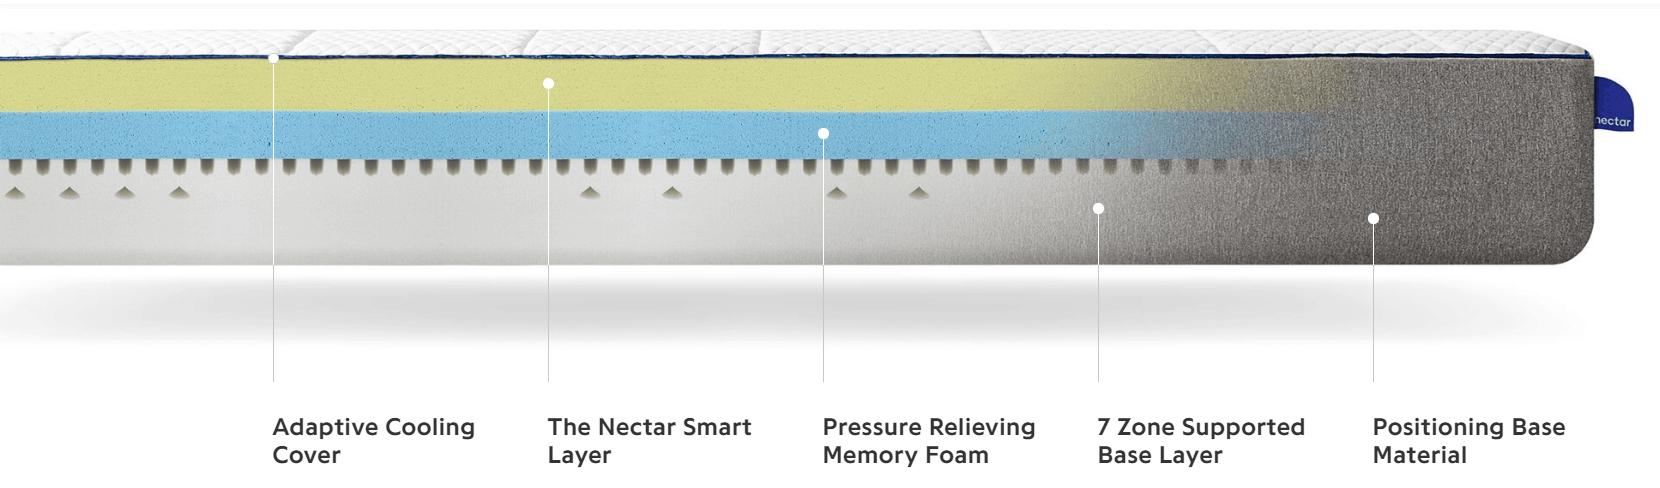 Layers of Nectar mattress UK version